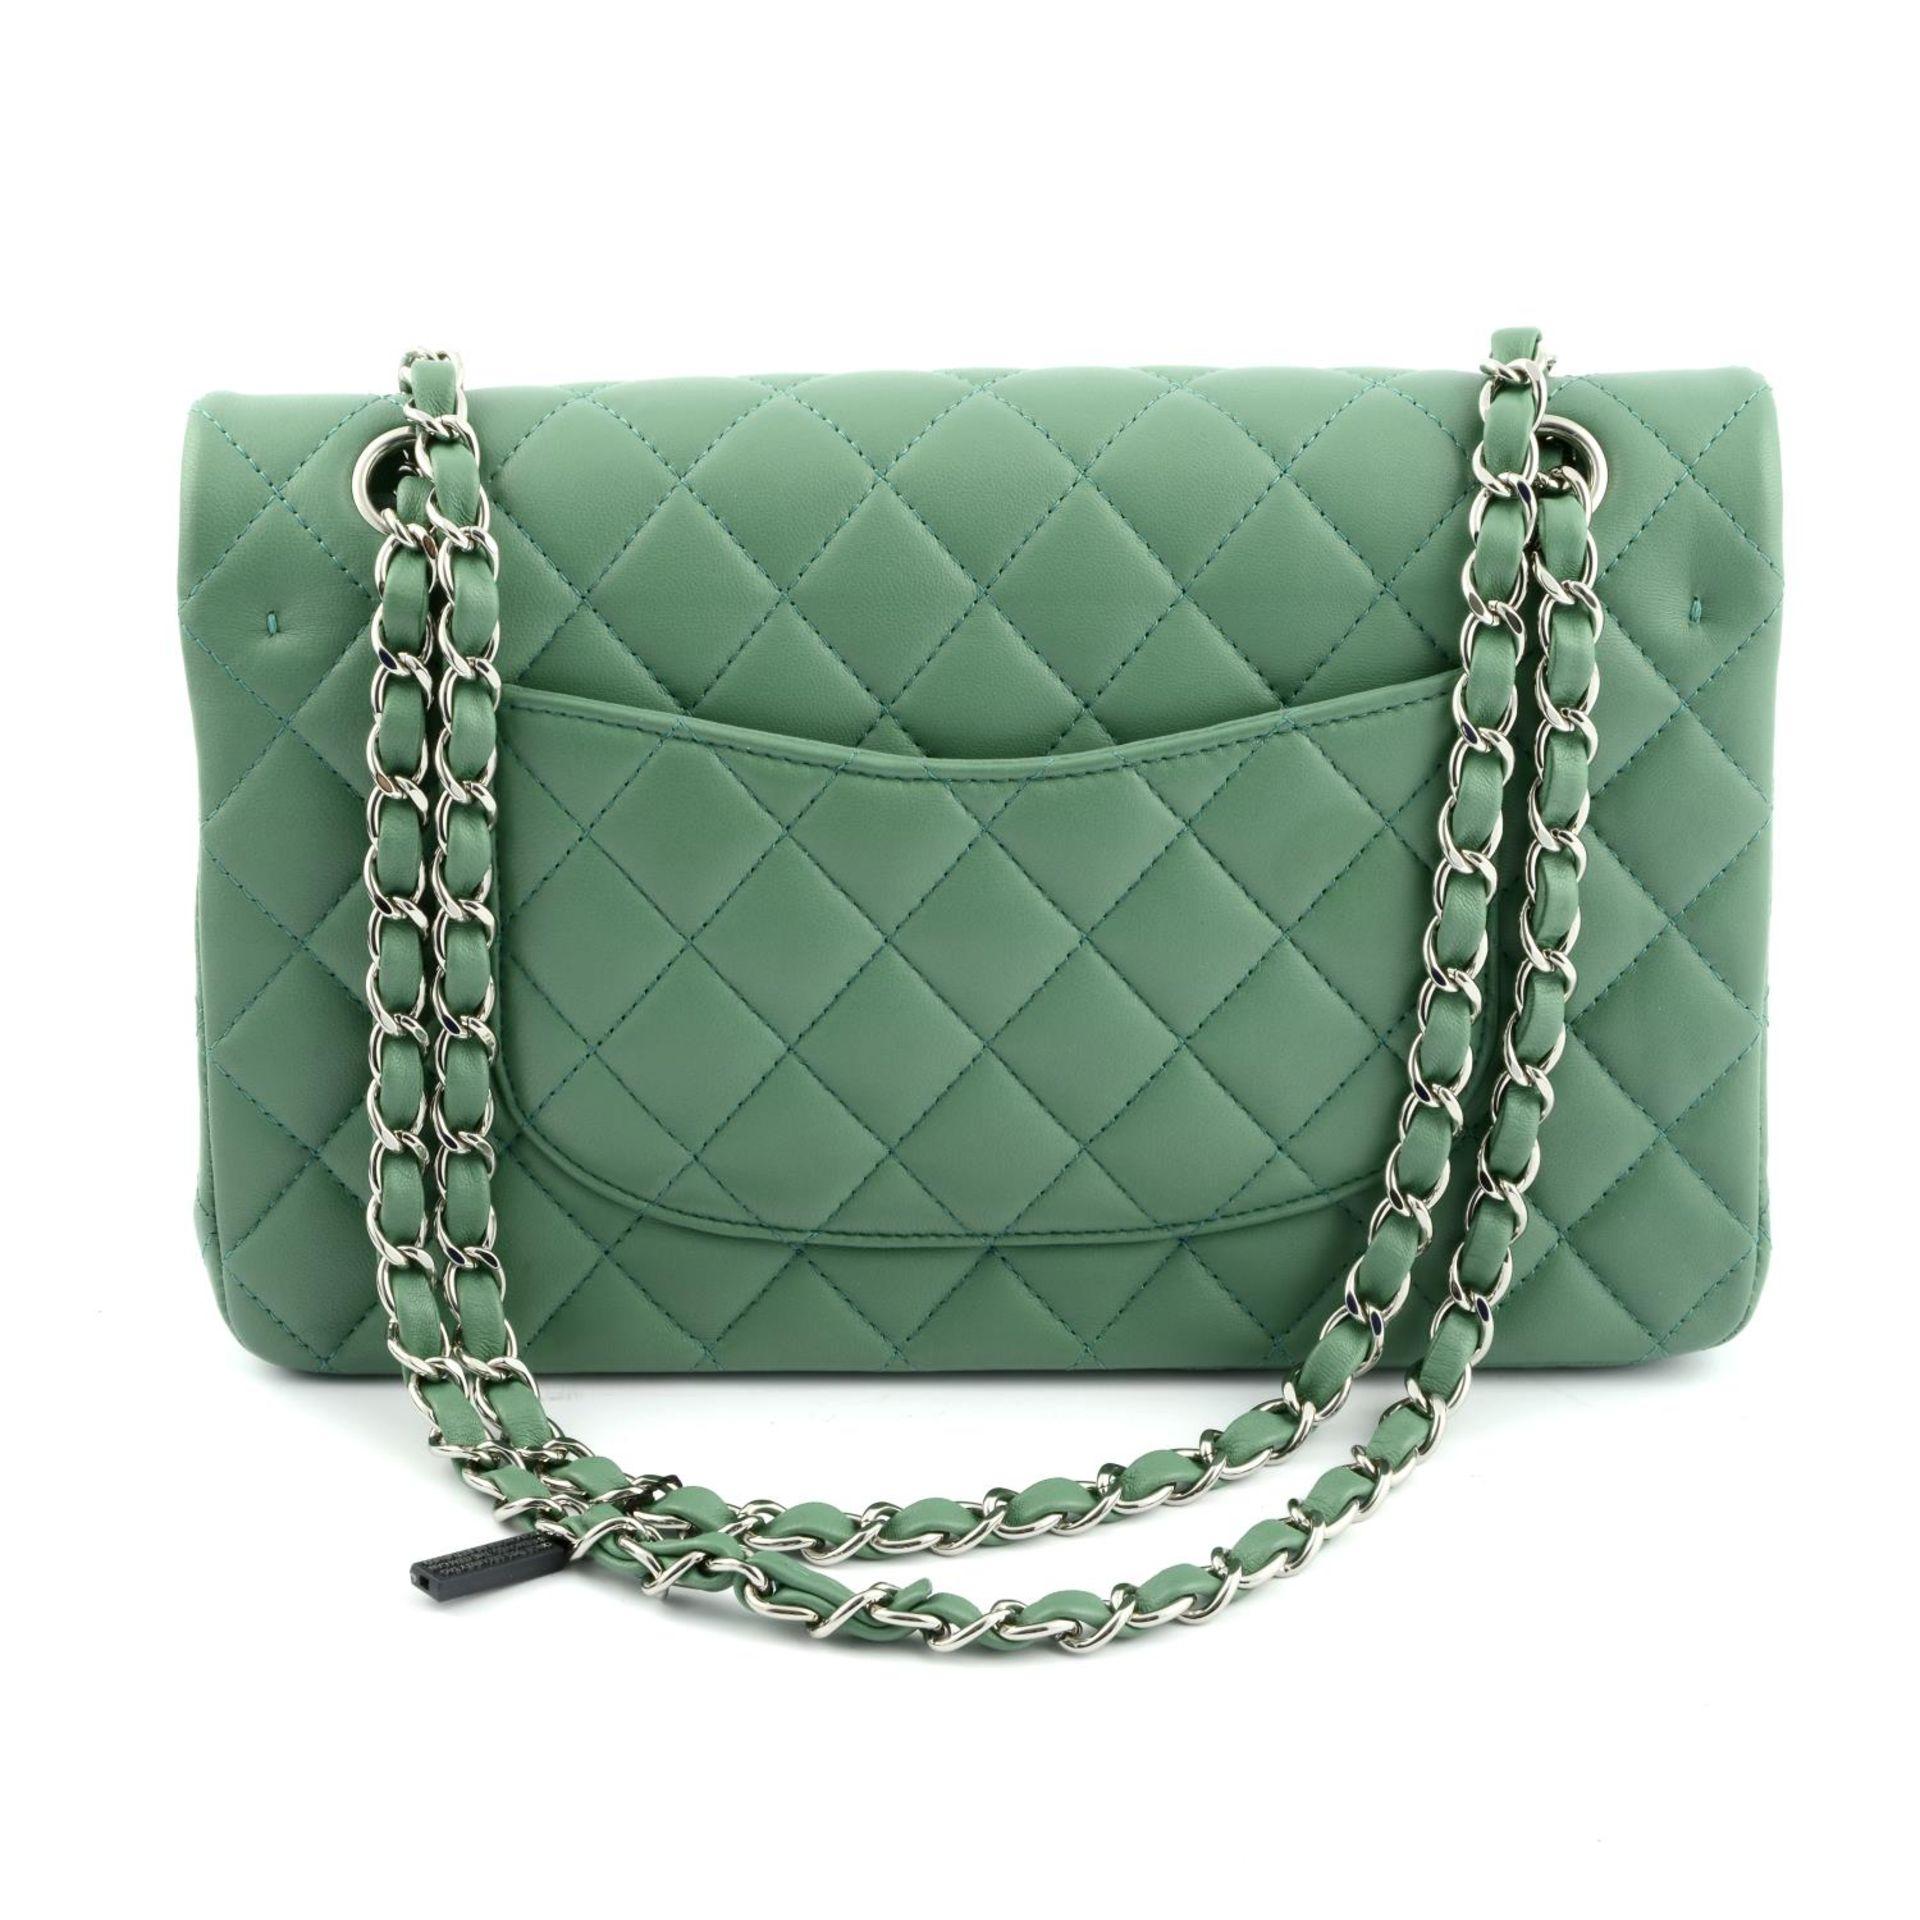 CHANEL - a green medium classic double flap handbag. - Image 2 of 7